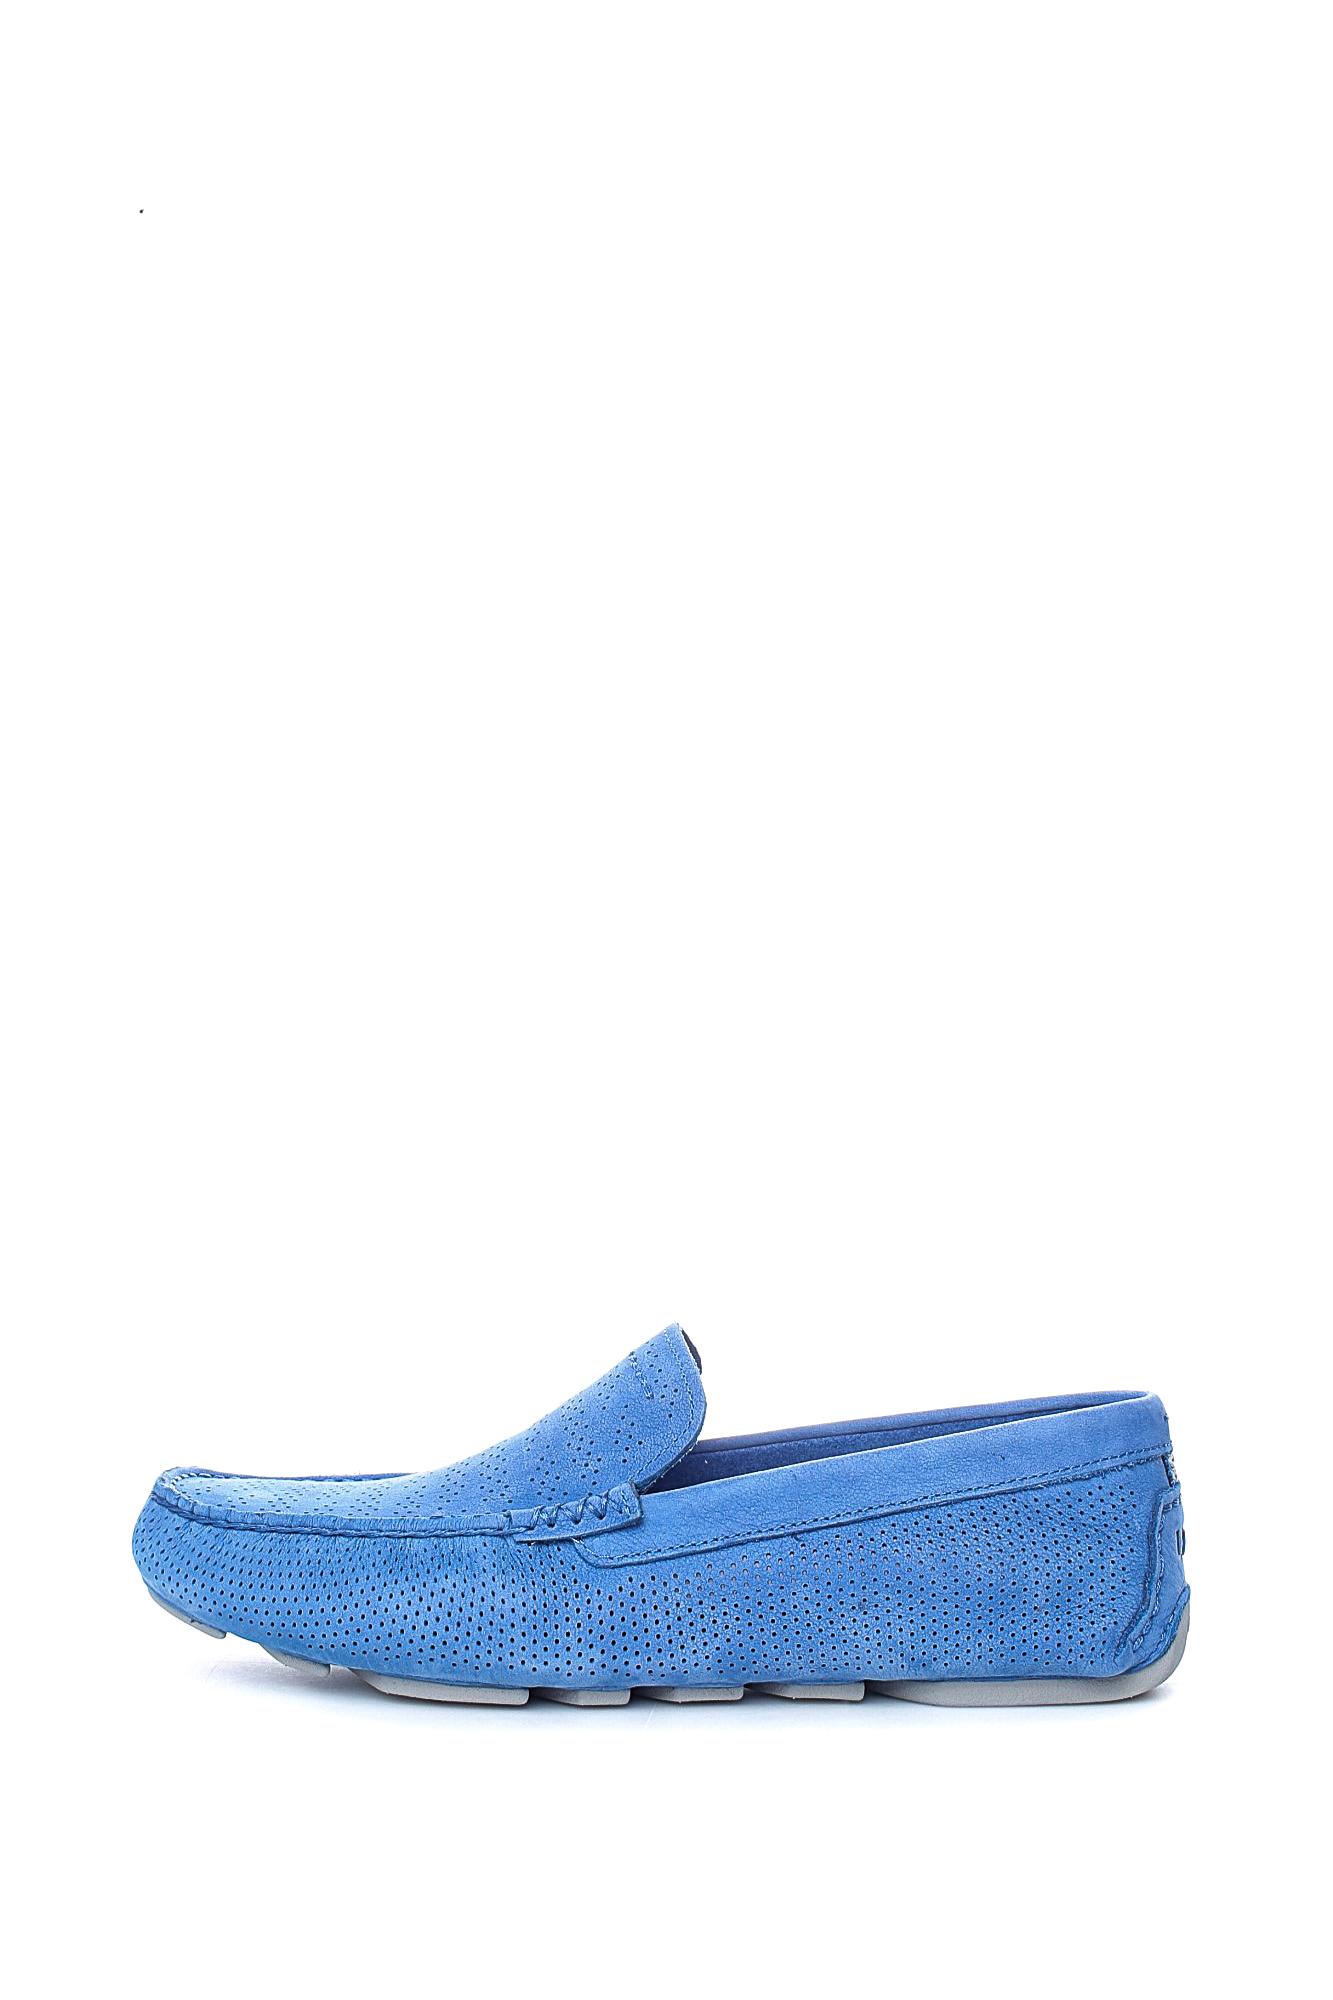 UGG - Ανδρικά παπούτσια Henrick Stripe Perf ανδρικά παπούτσια μοκασίνια loafers